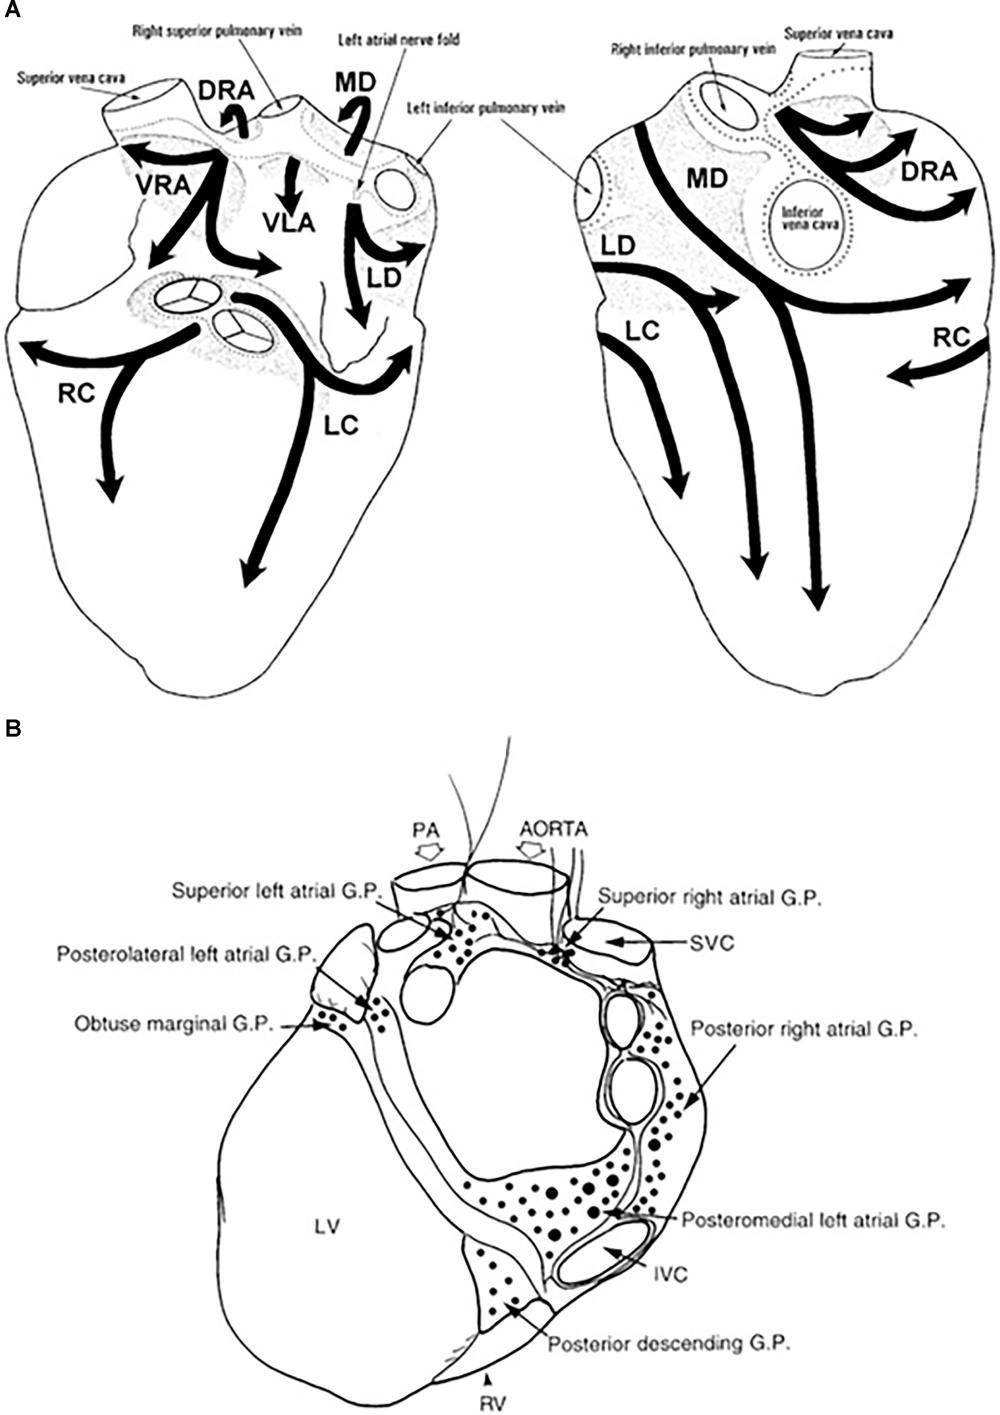 medium resolution of www frontiersin org figure 1 anatomy of the intrinsic autonomic nervous